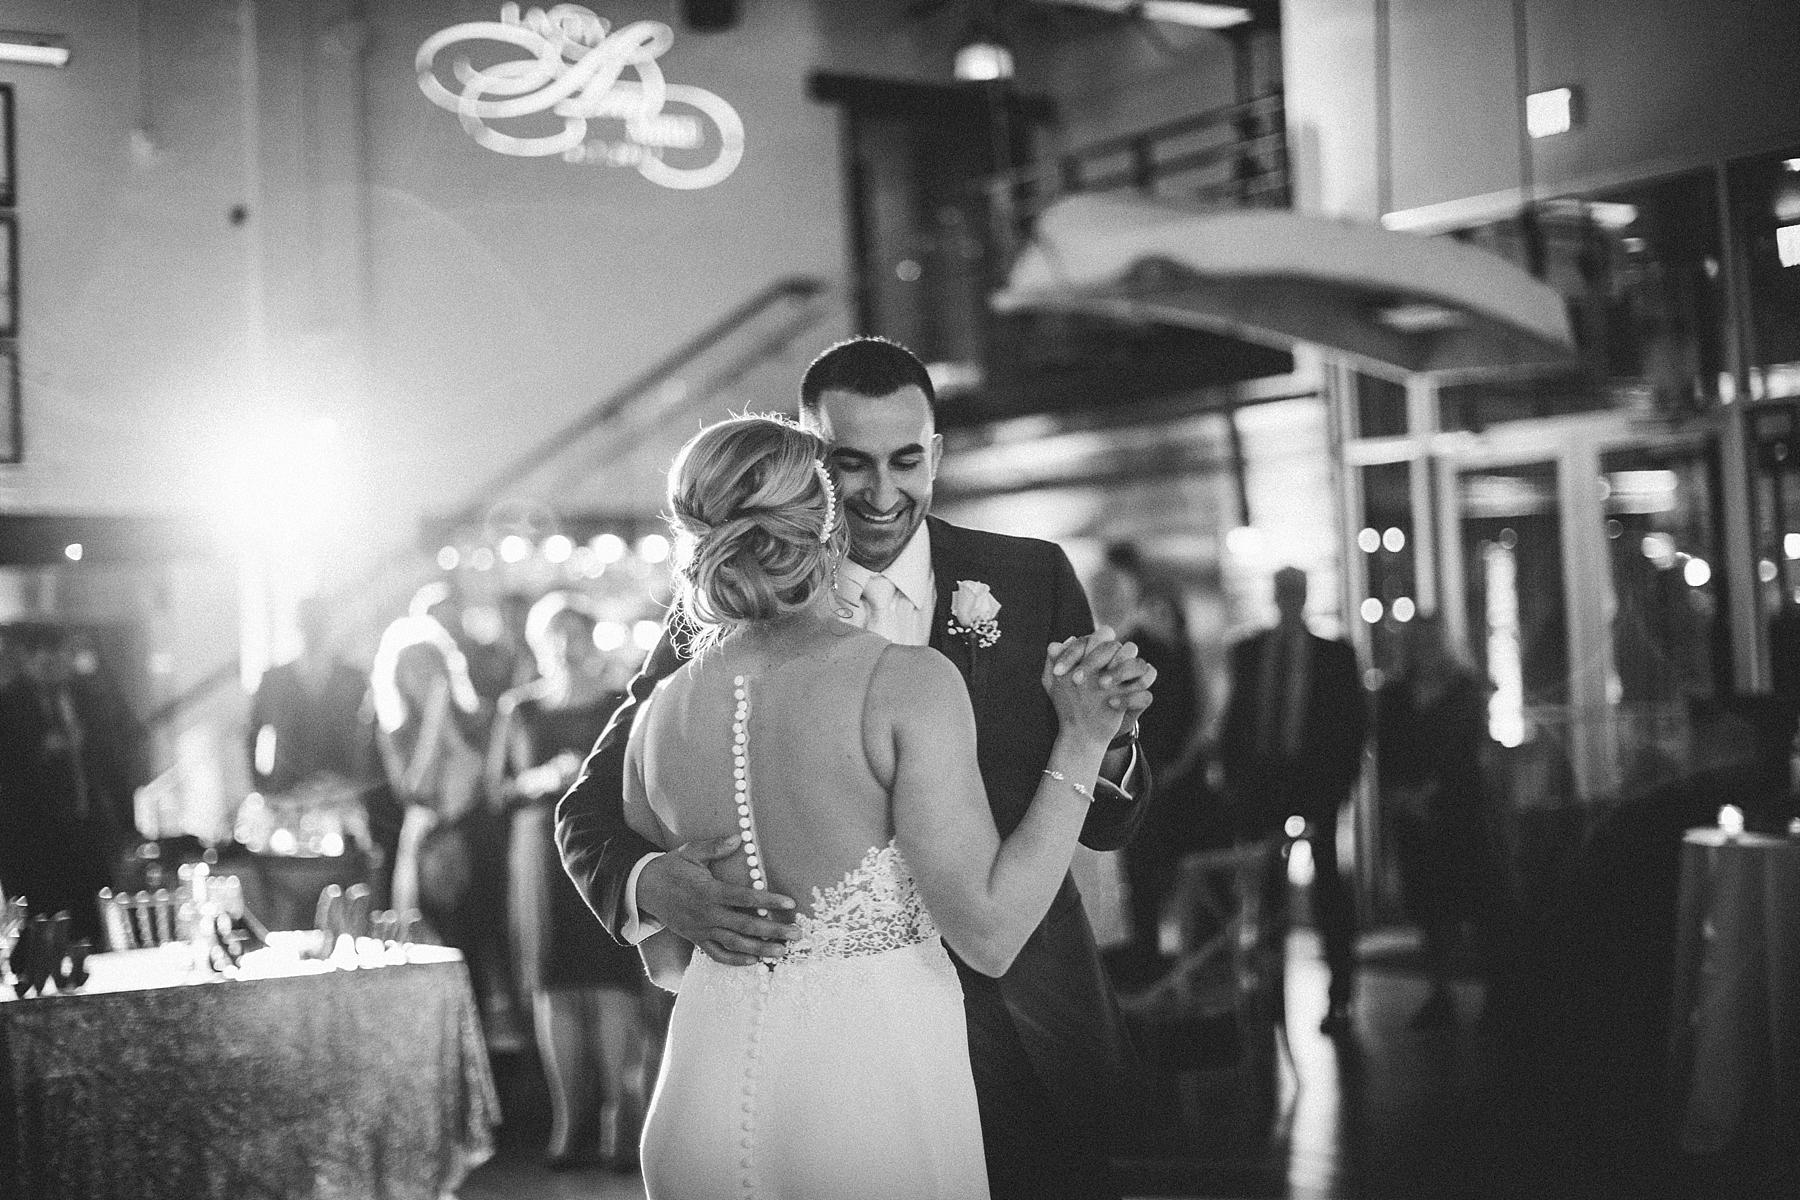 jersey-city-nj-wedding-photographer-top_0043.jpg